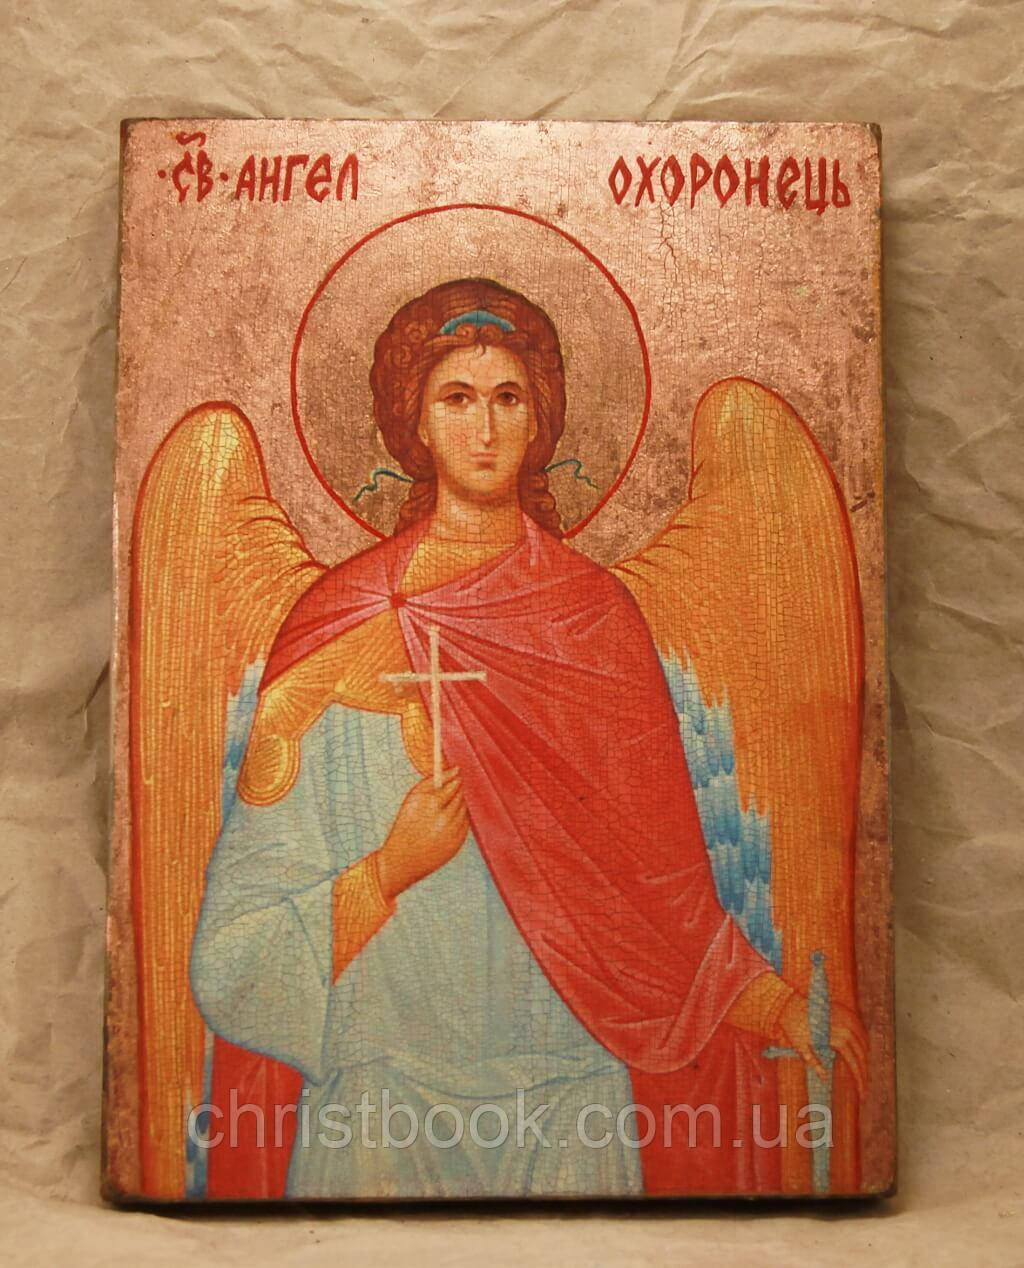 Ангел Охоронець 2